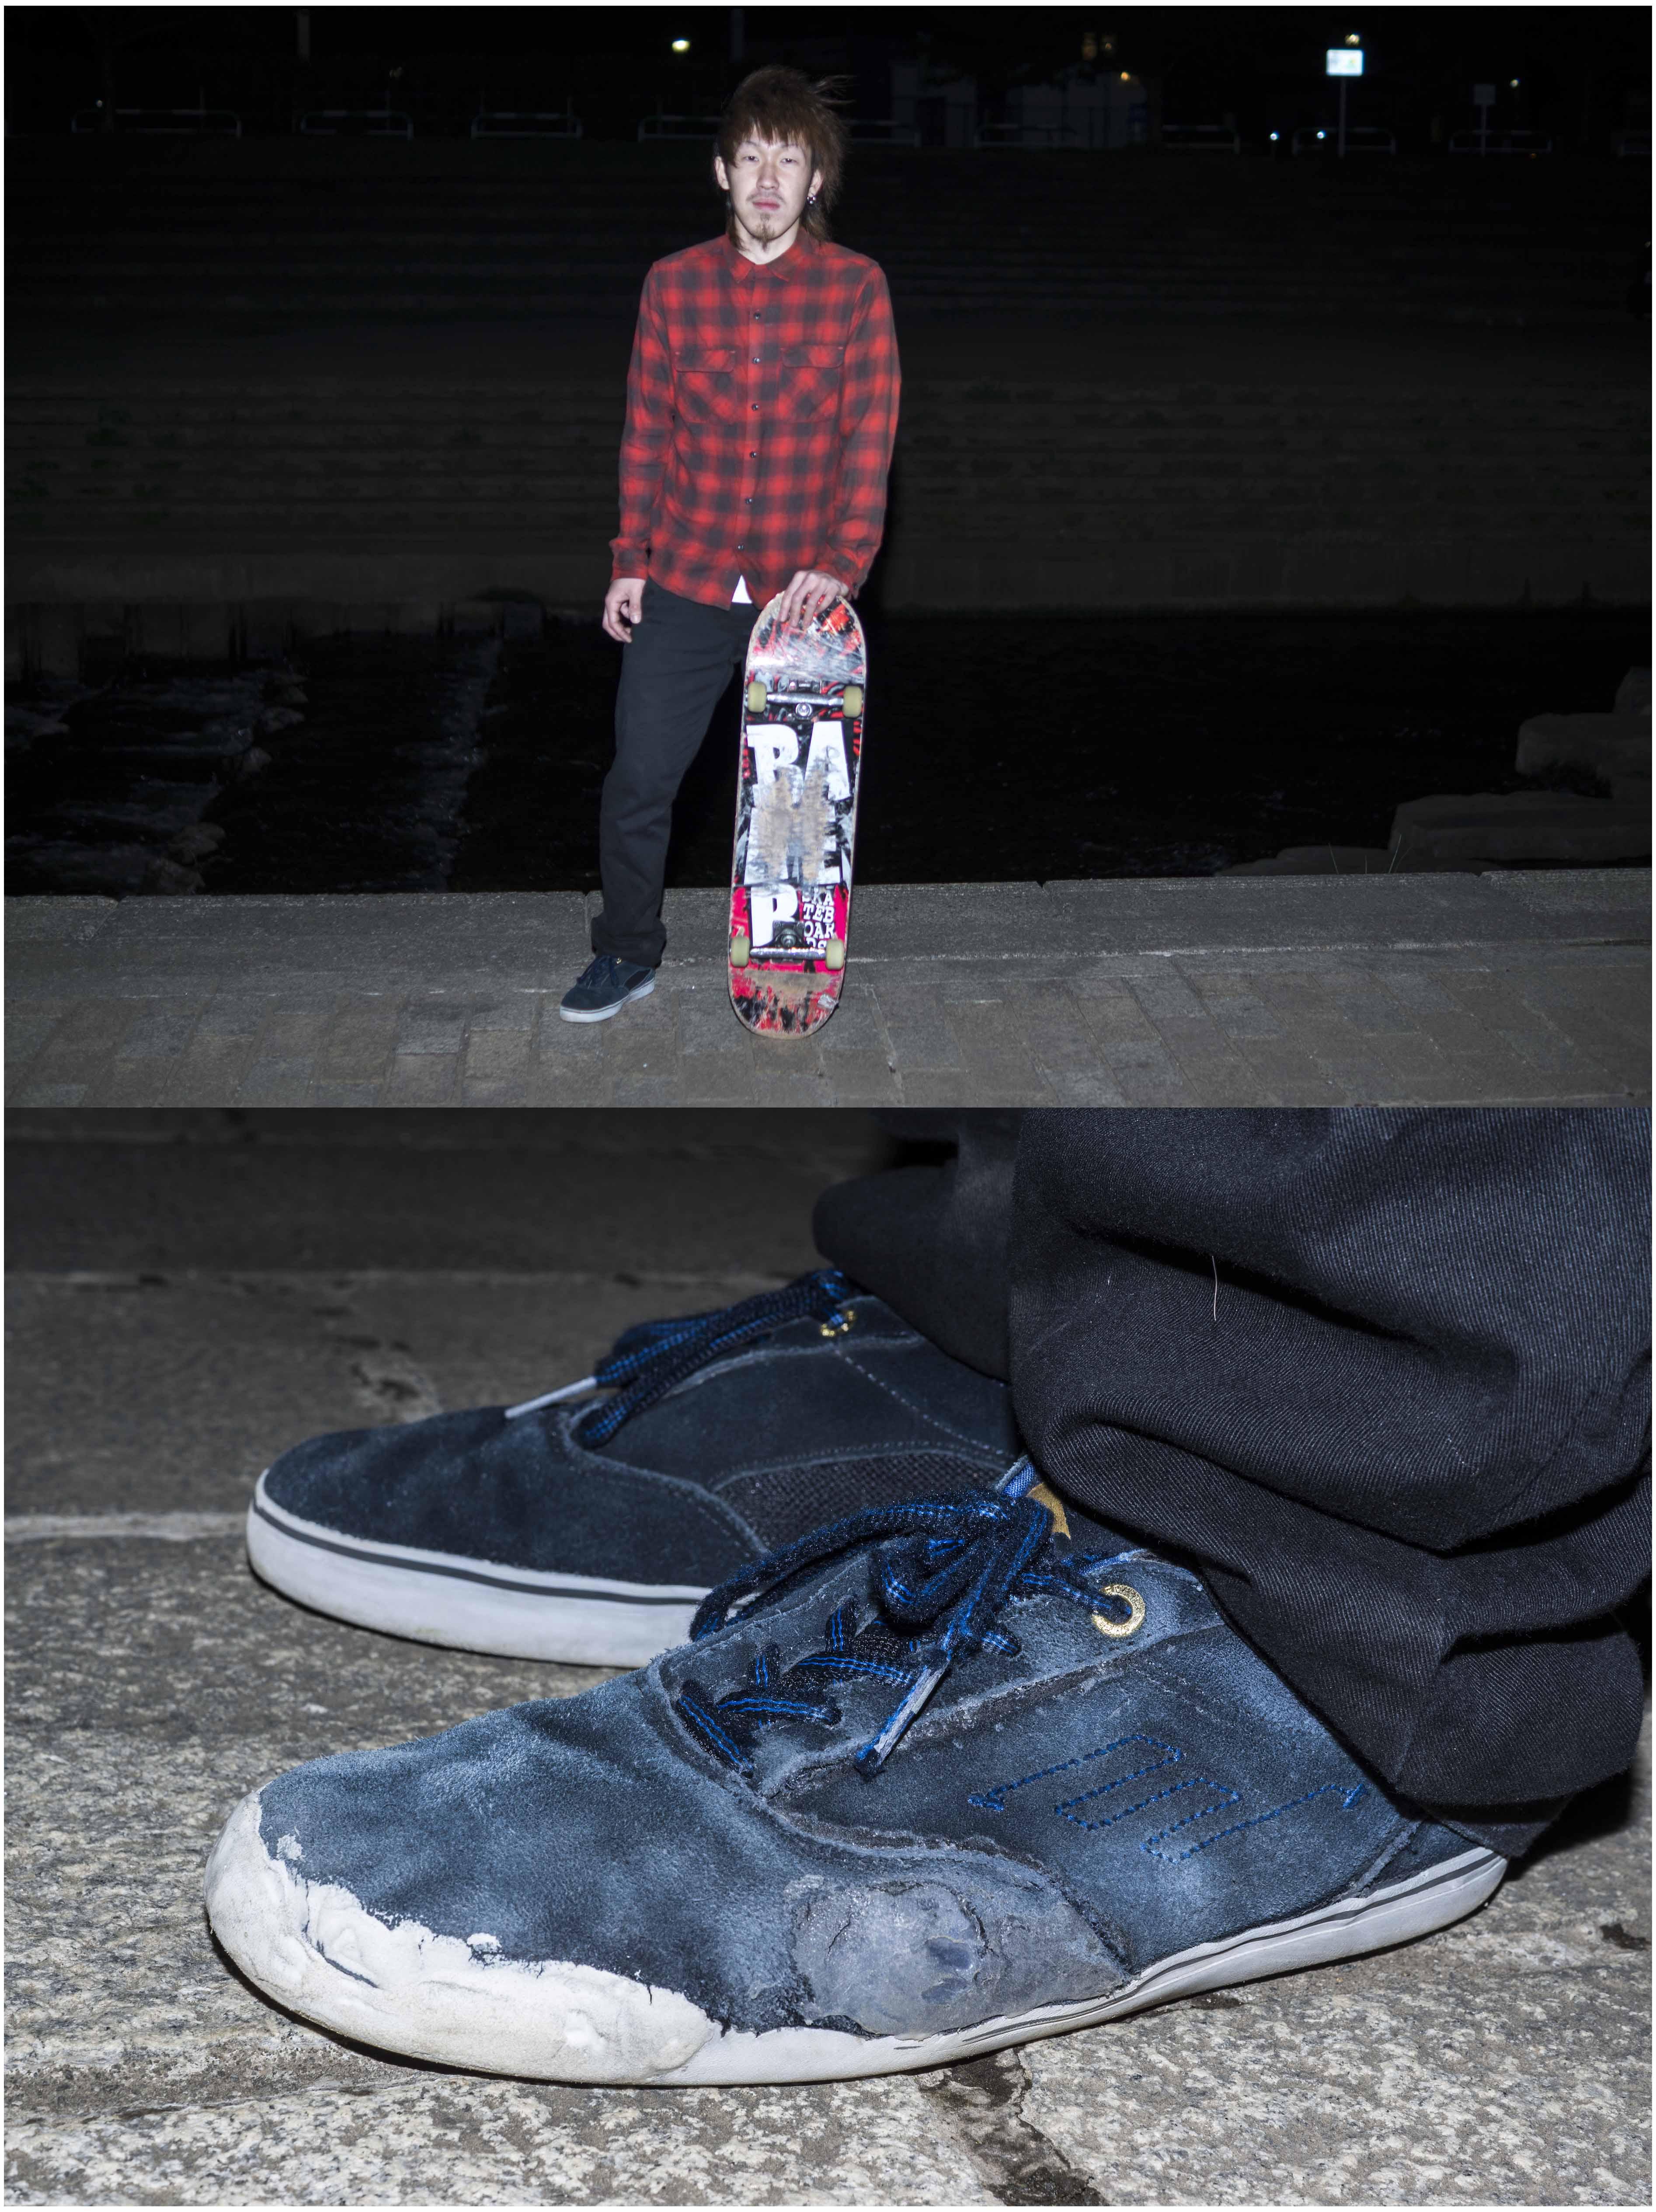 Symbol of skateboard 尾崎 信哉